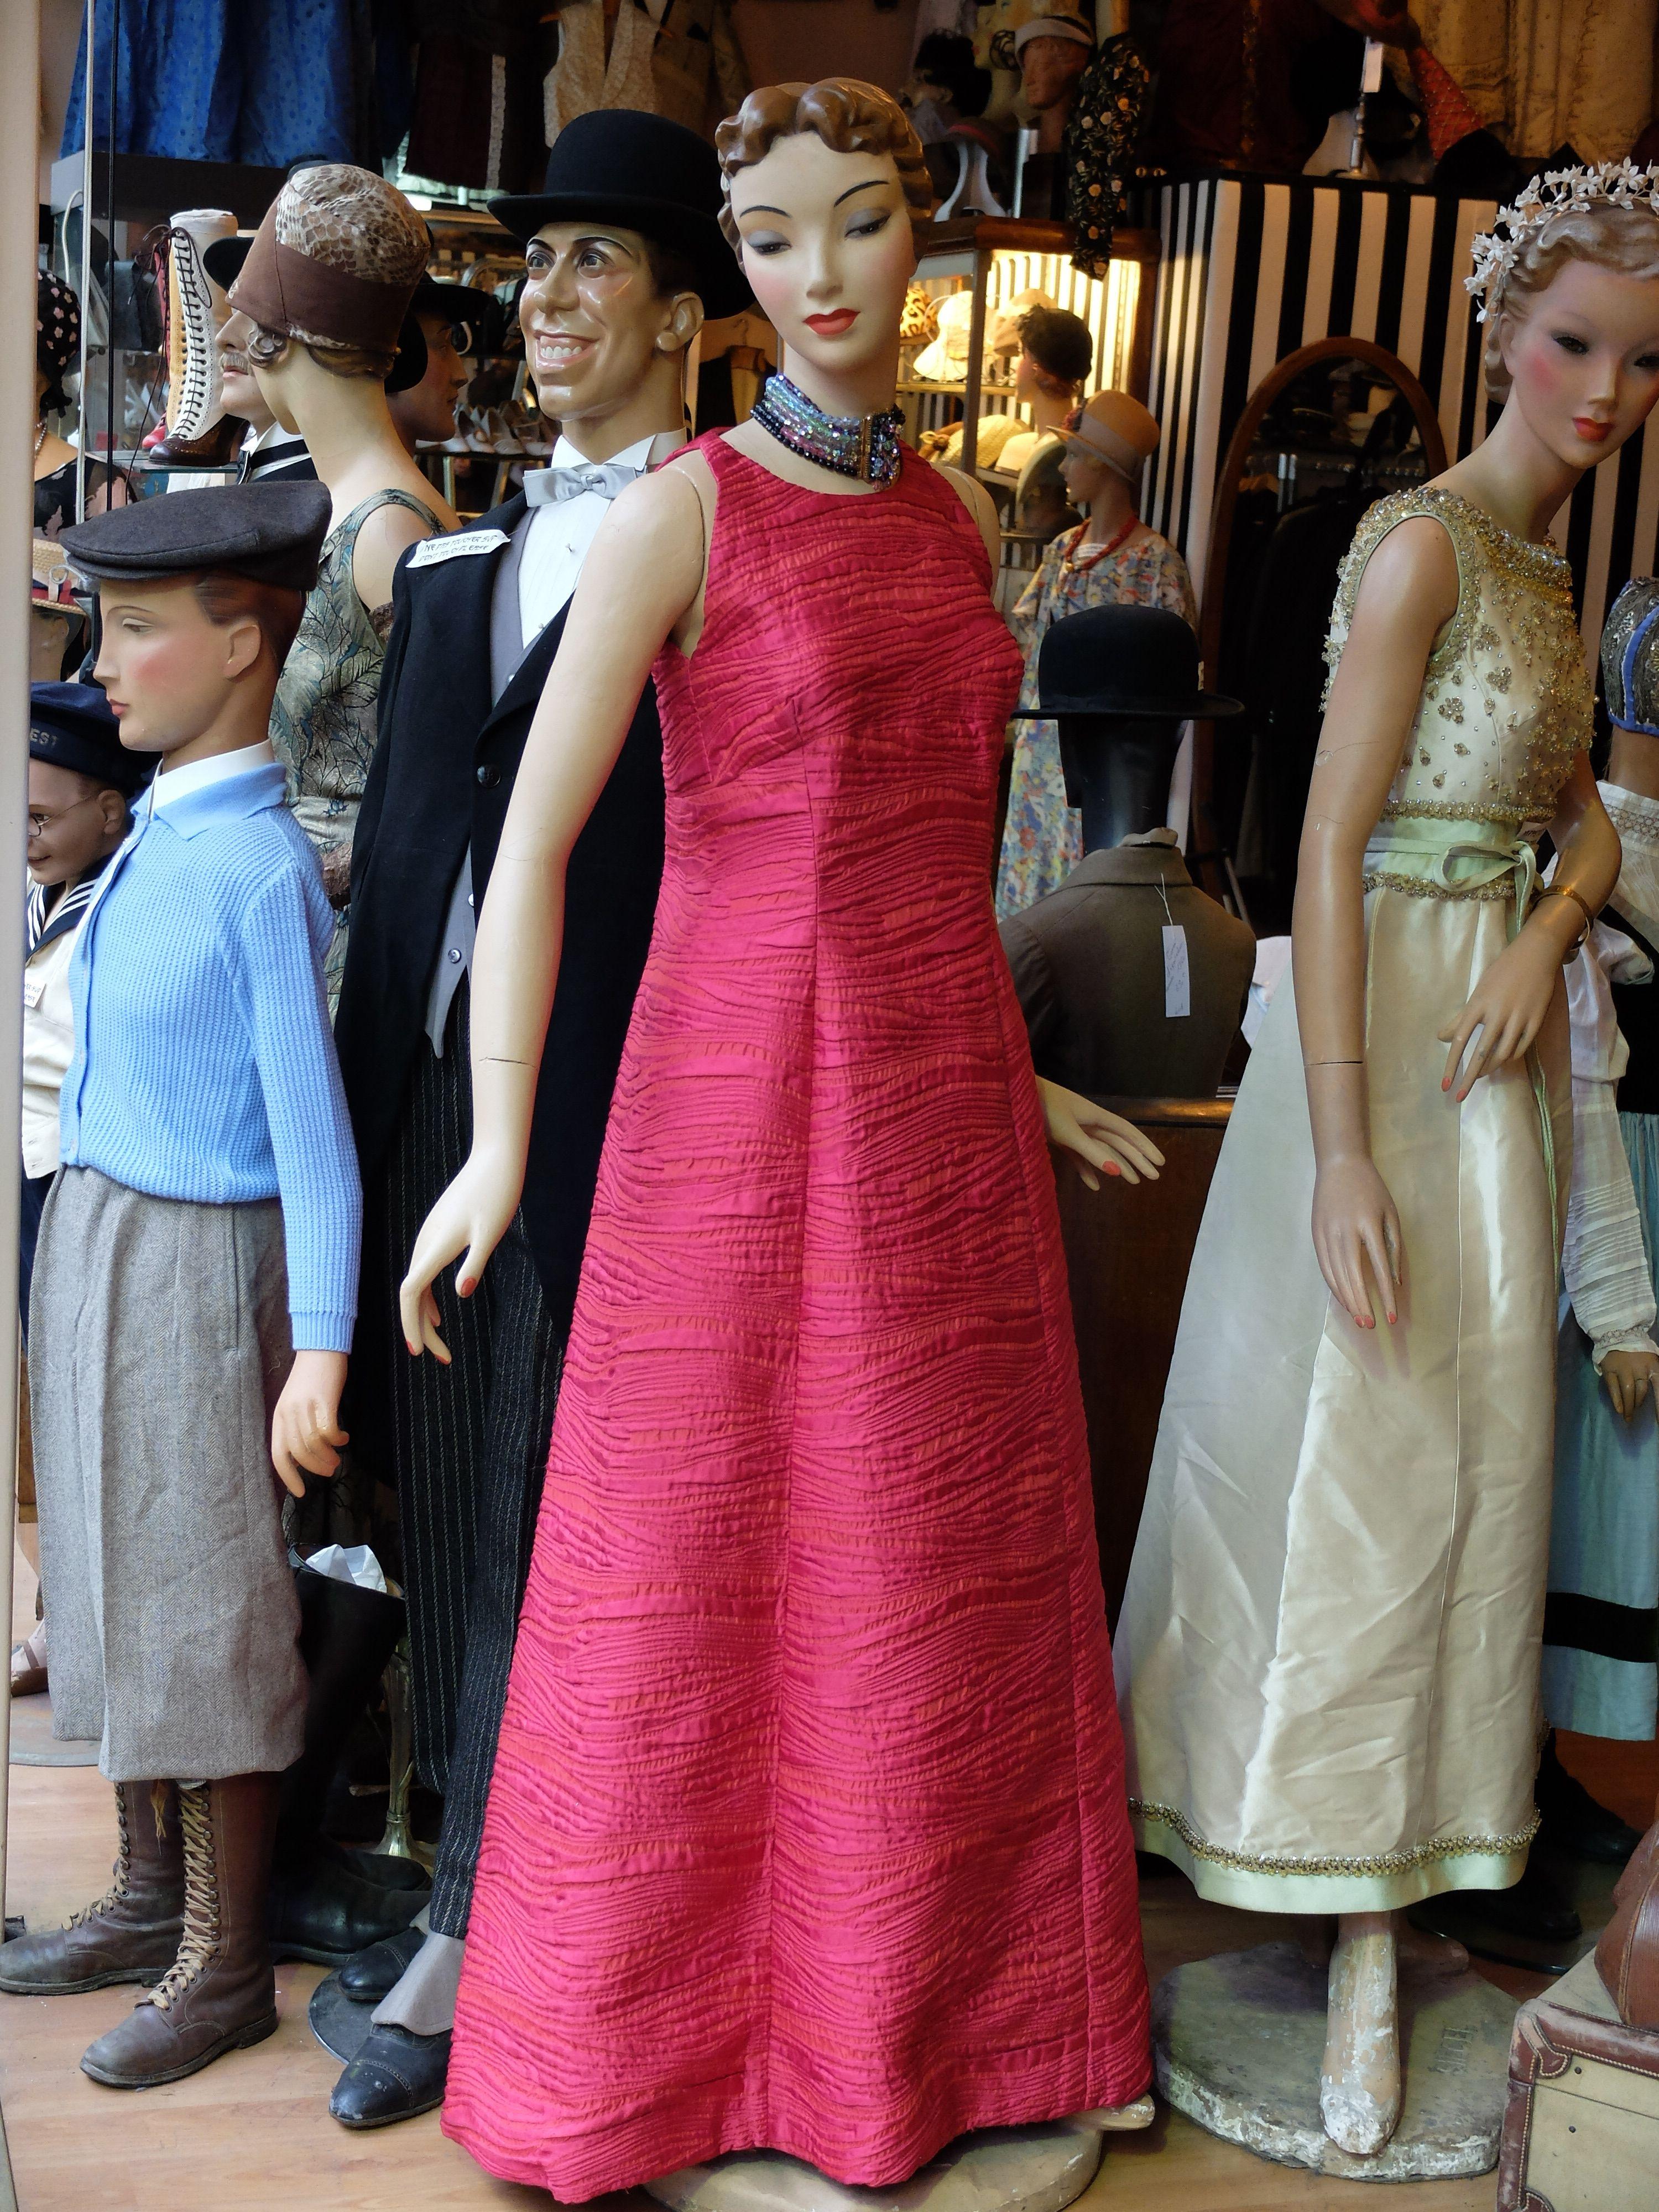 2 Robes Du Soir Balmain Annees 60 Robe Du Soir Costume Historique Robe